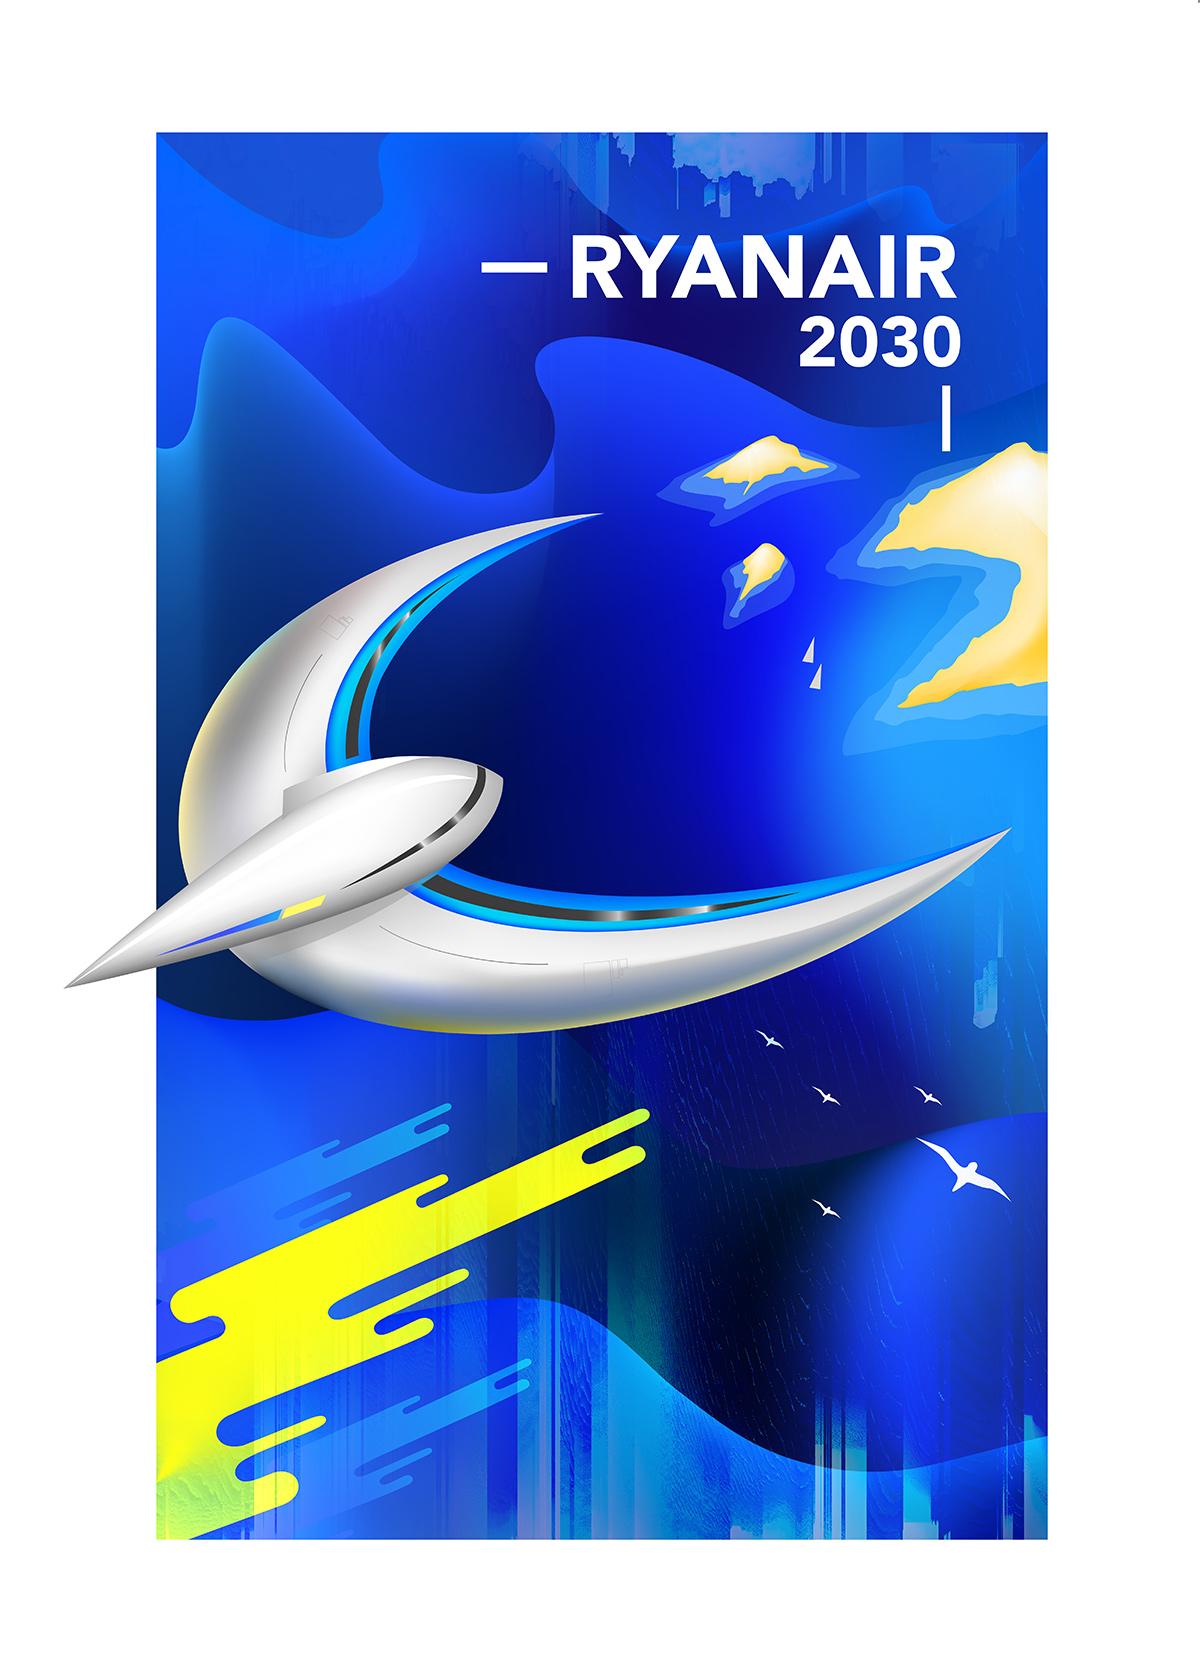 Aerolíneas_Ryanair